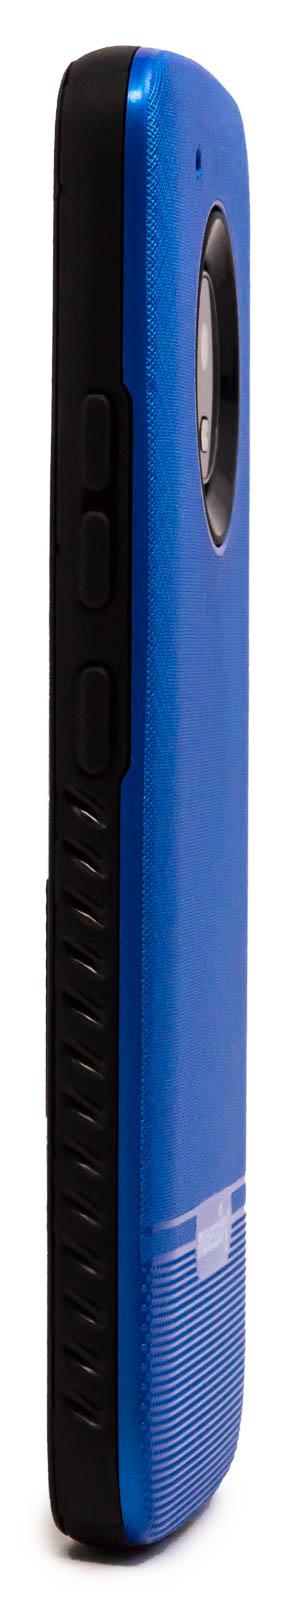 Moto-G5-Plus-Case-Moto-X-17-Case-Ultra-Thin-Hard-Body-Tactile-Shell-Cover thumbnail 8